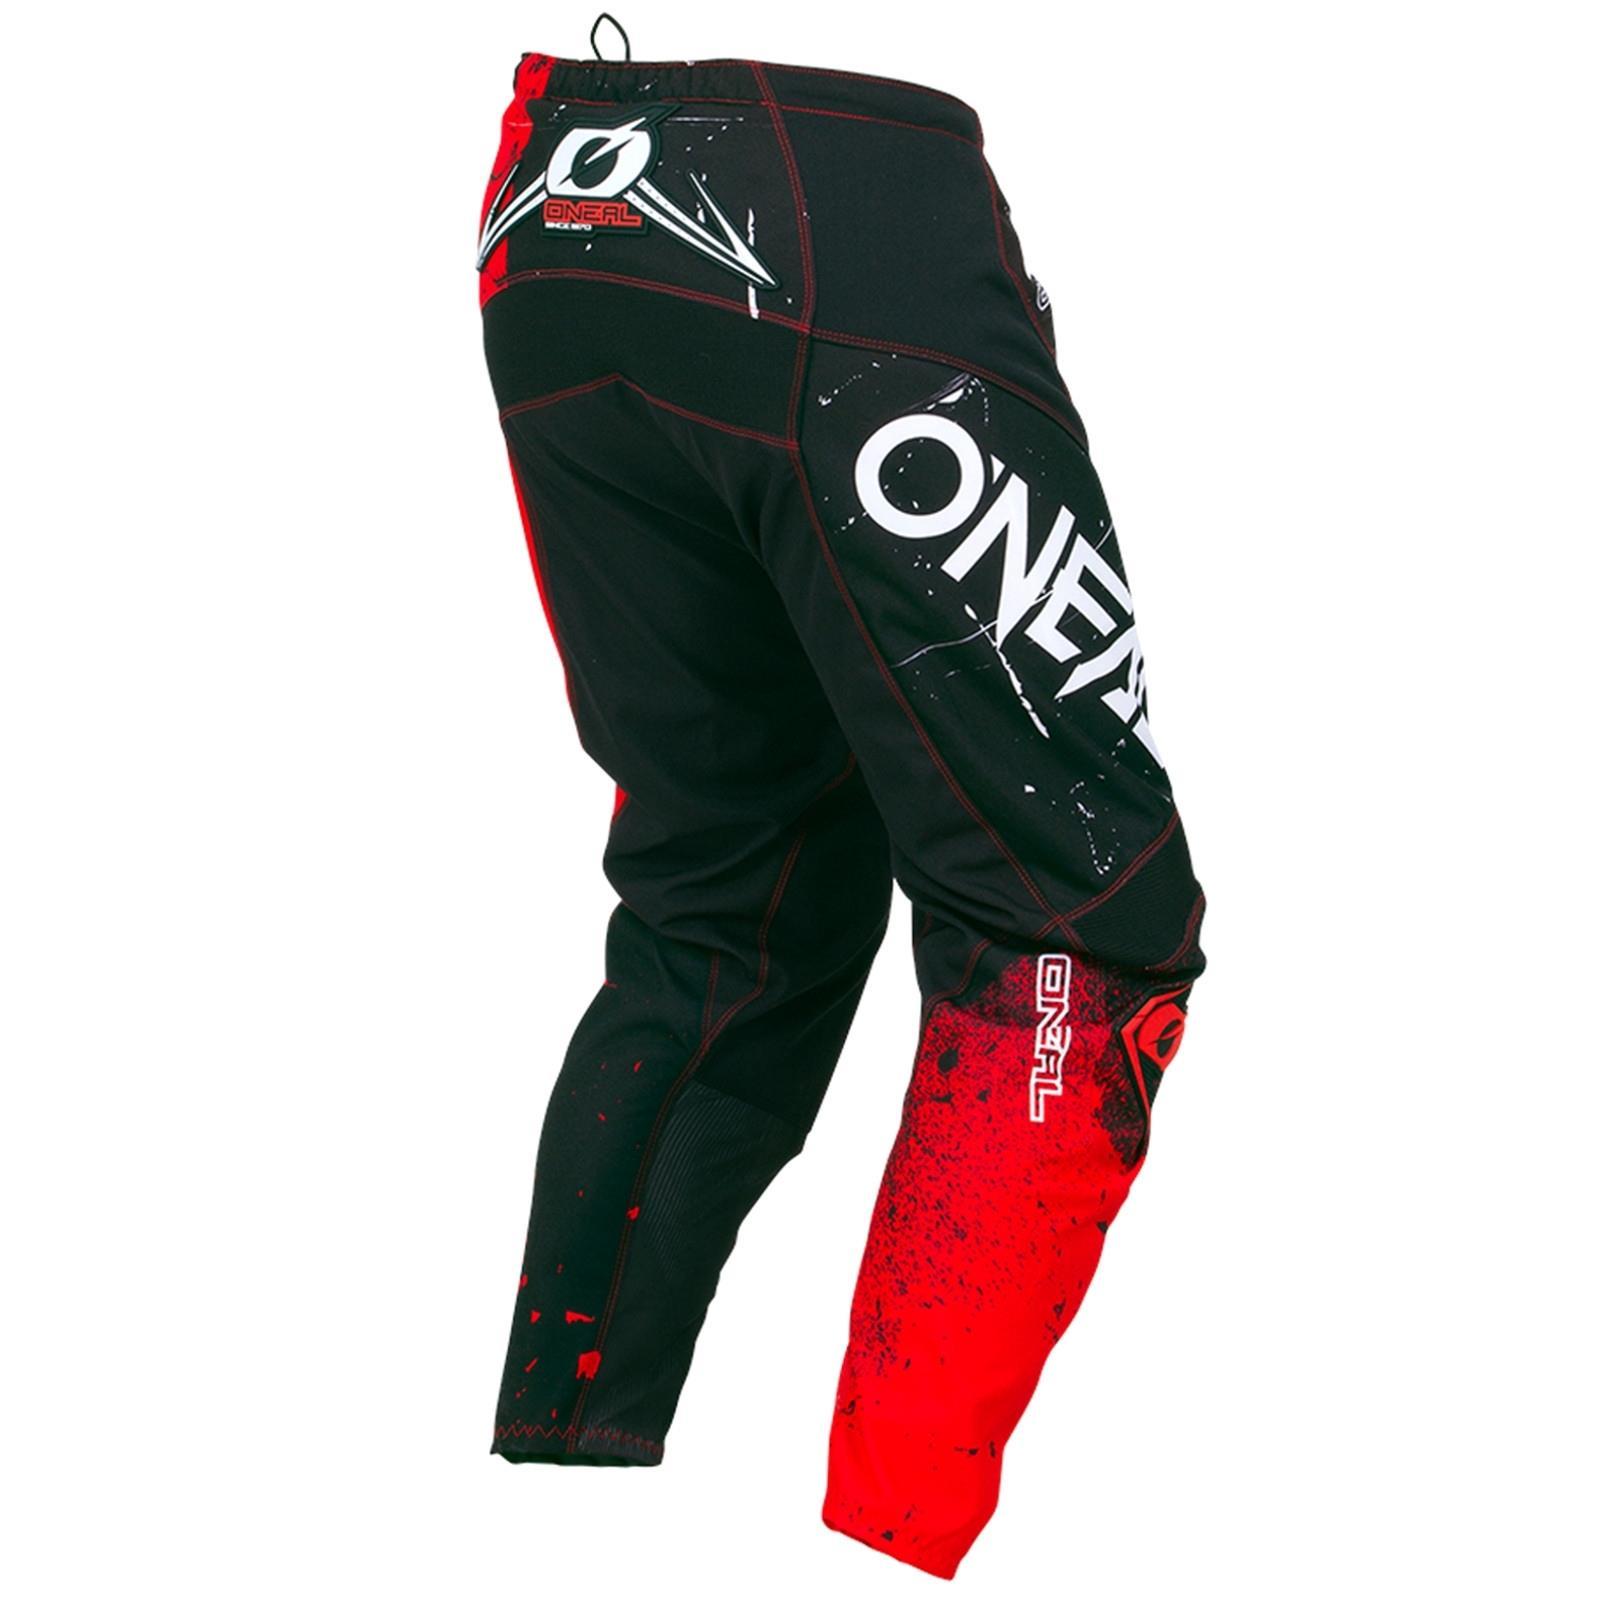 ONeal-pantalones-de-Jersey-de-los-ninos-de-pantalones-cortos-ninos-MX-bicicleta-DH-montana-bicicleta miniatura 119